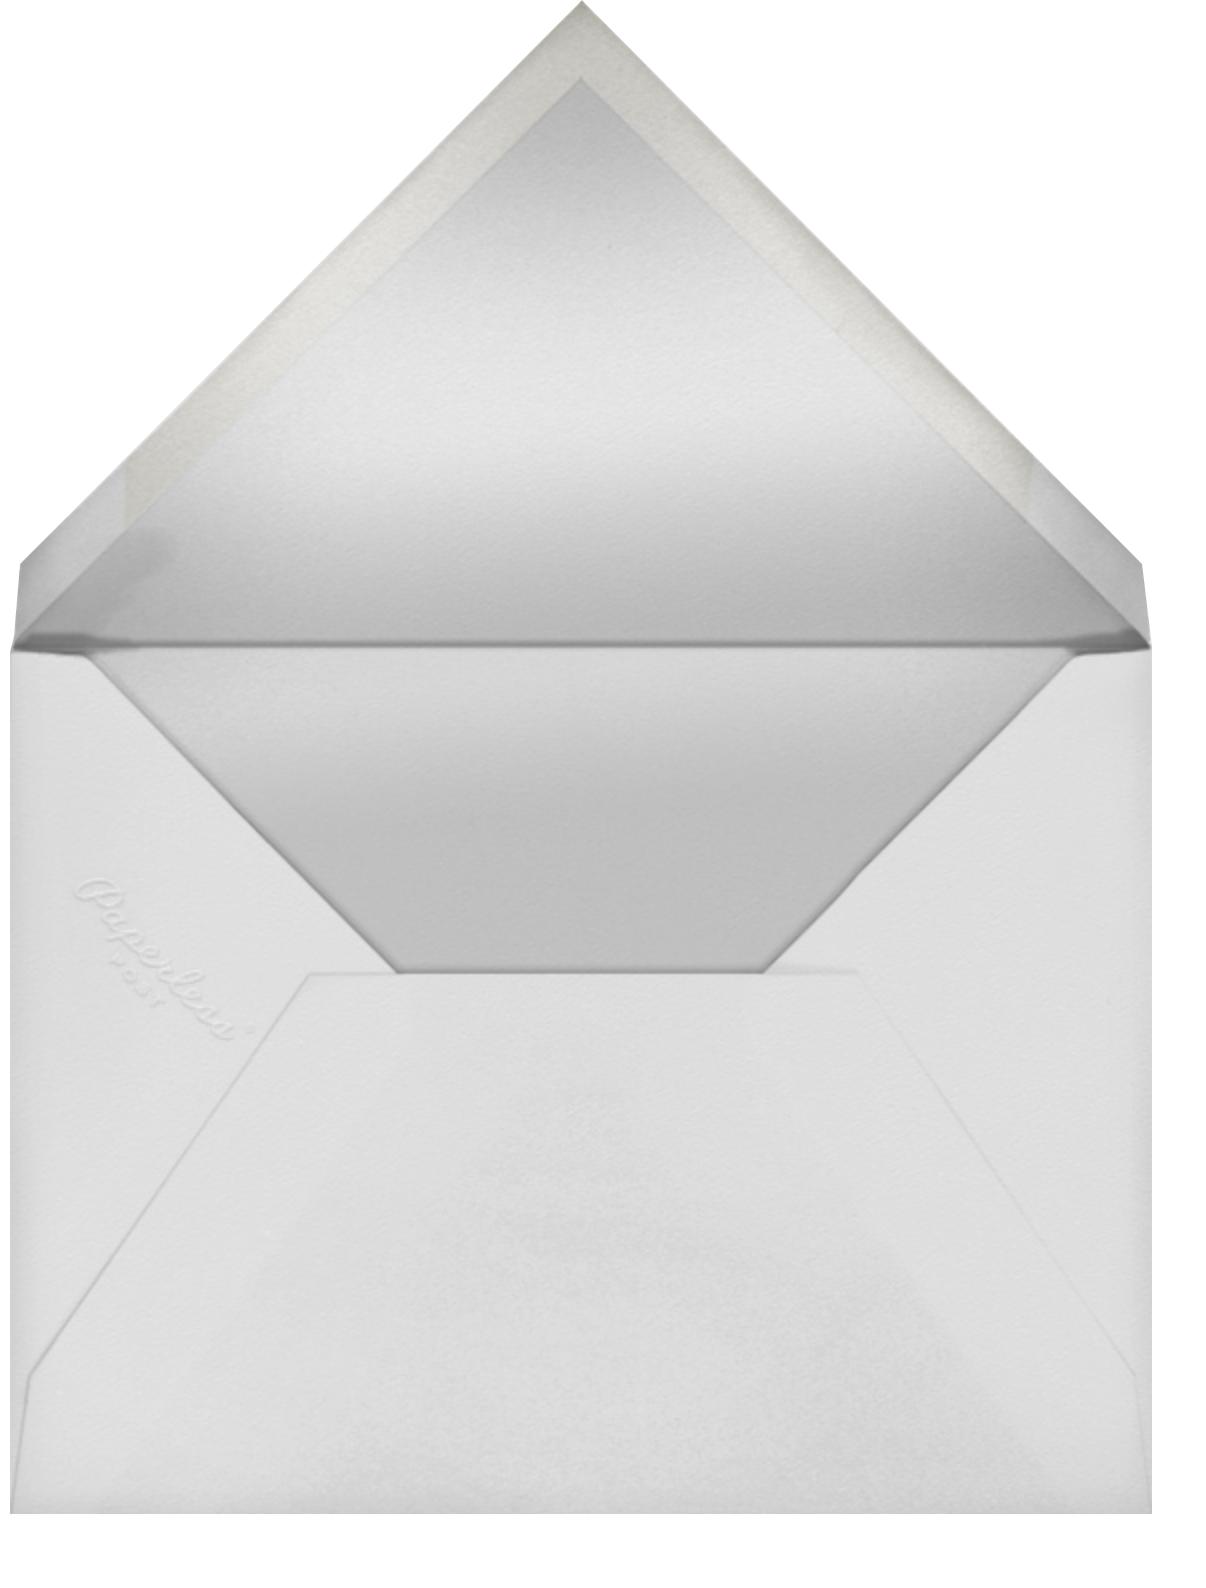 Lamina I (Menu) - Gold - Paperless Post - Menus and programs - envelope back